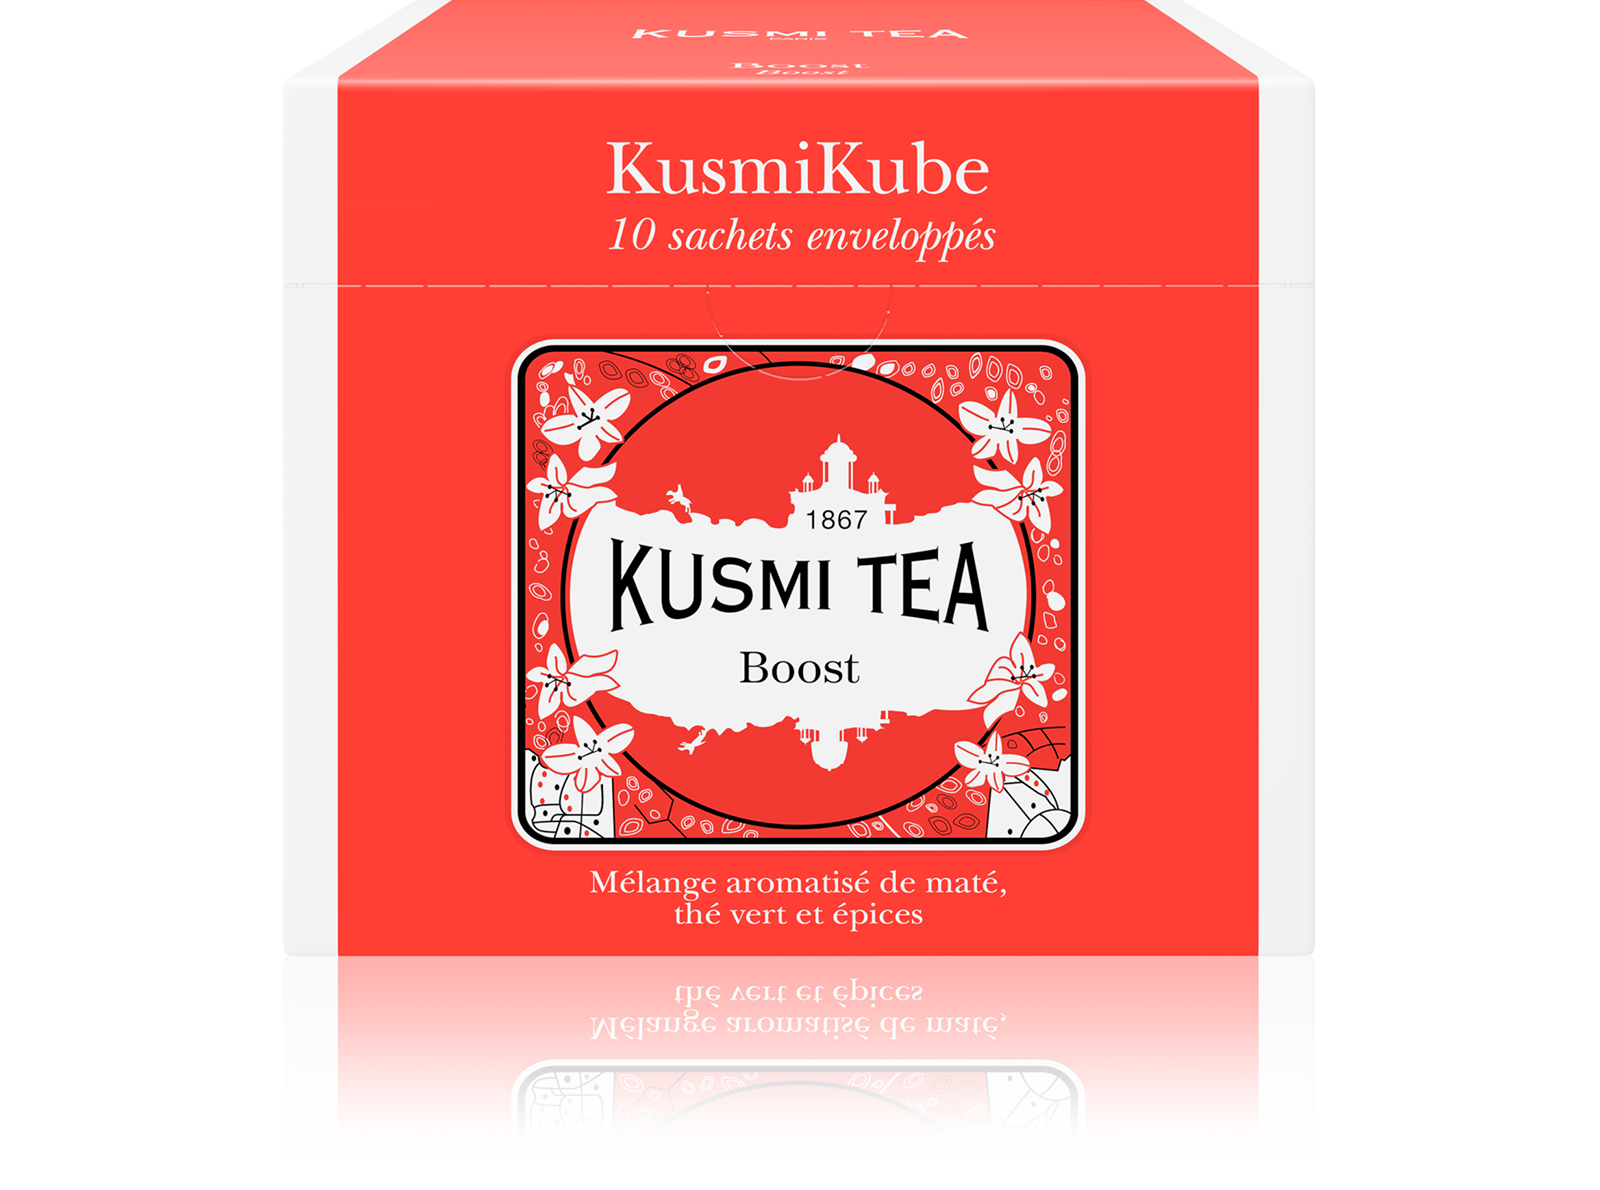 Thé vert, maté - Boost - Sachets - Kusmi Tea